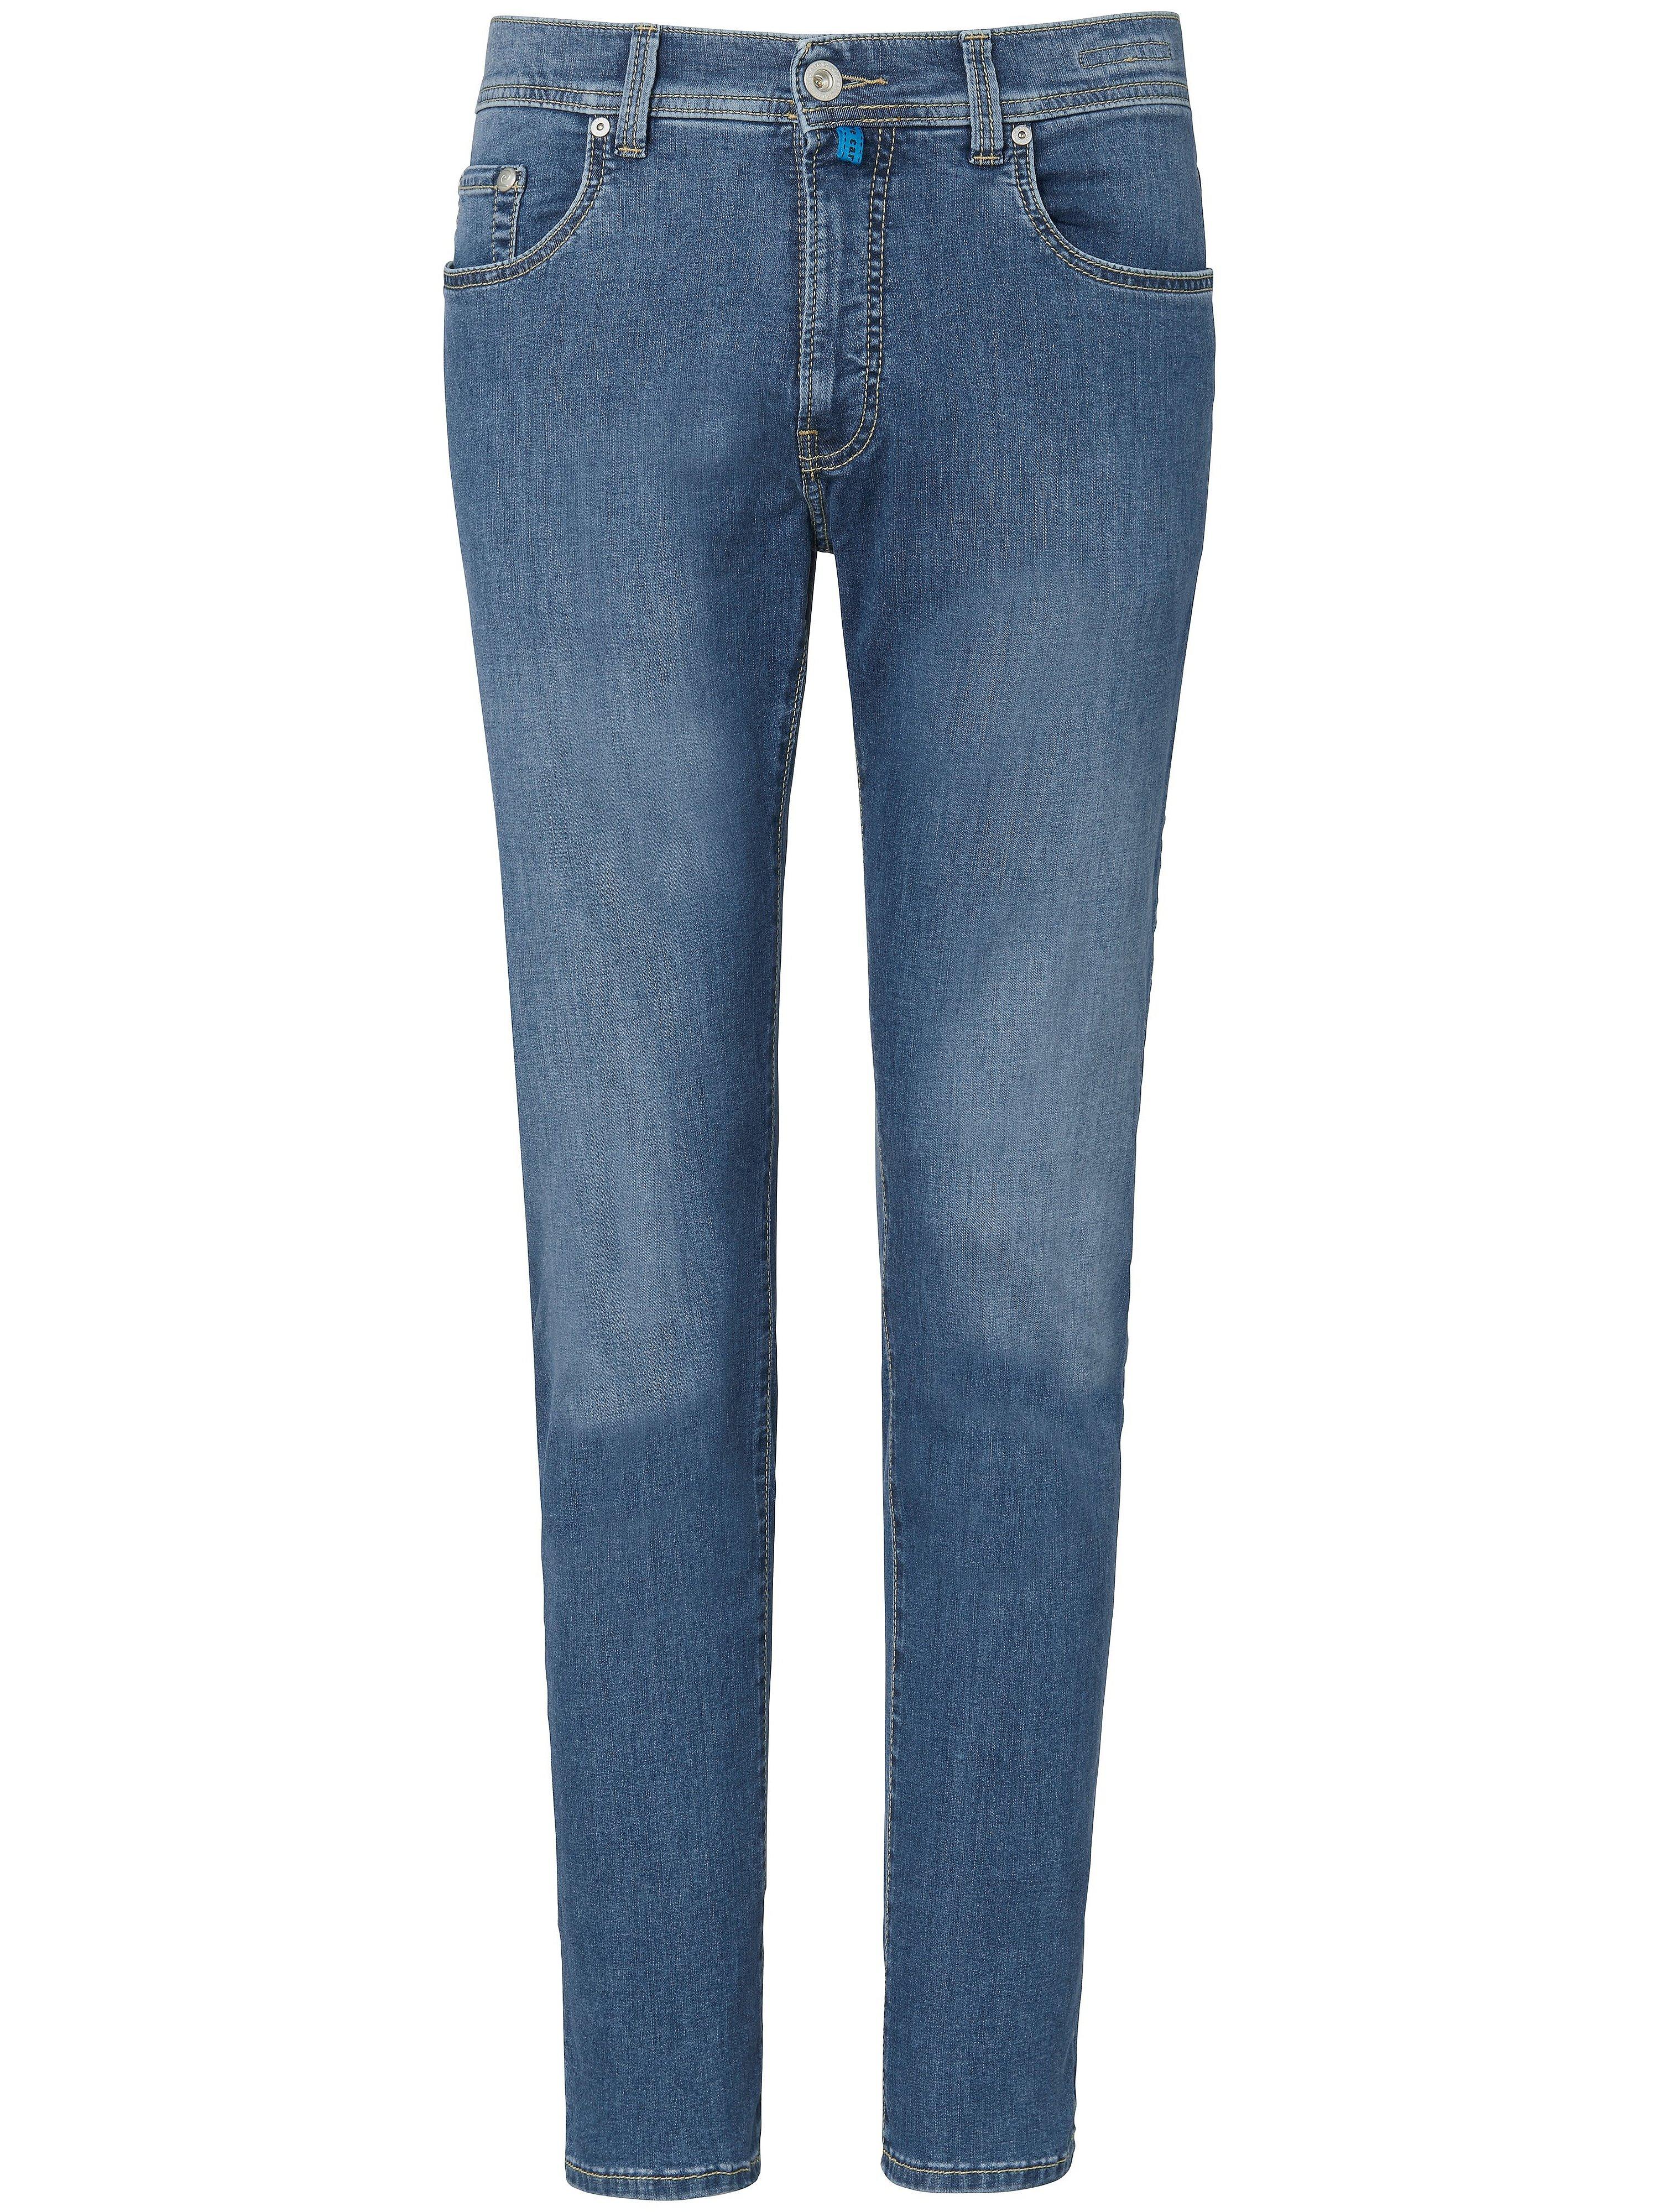 Jeans model Lyon Tapered van FutureFlex-denim Van Pierre Cardin denim